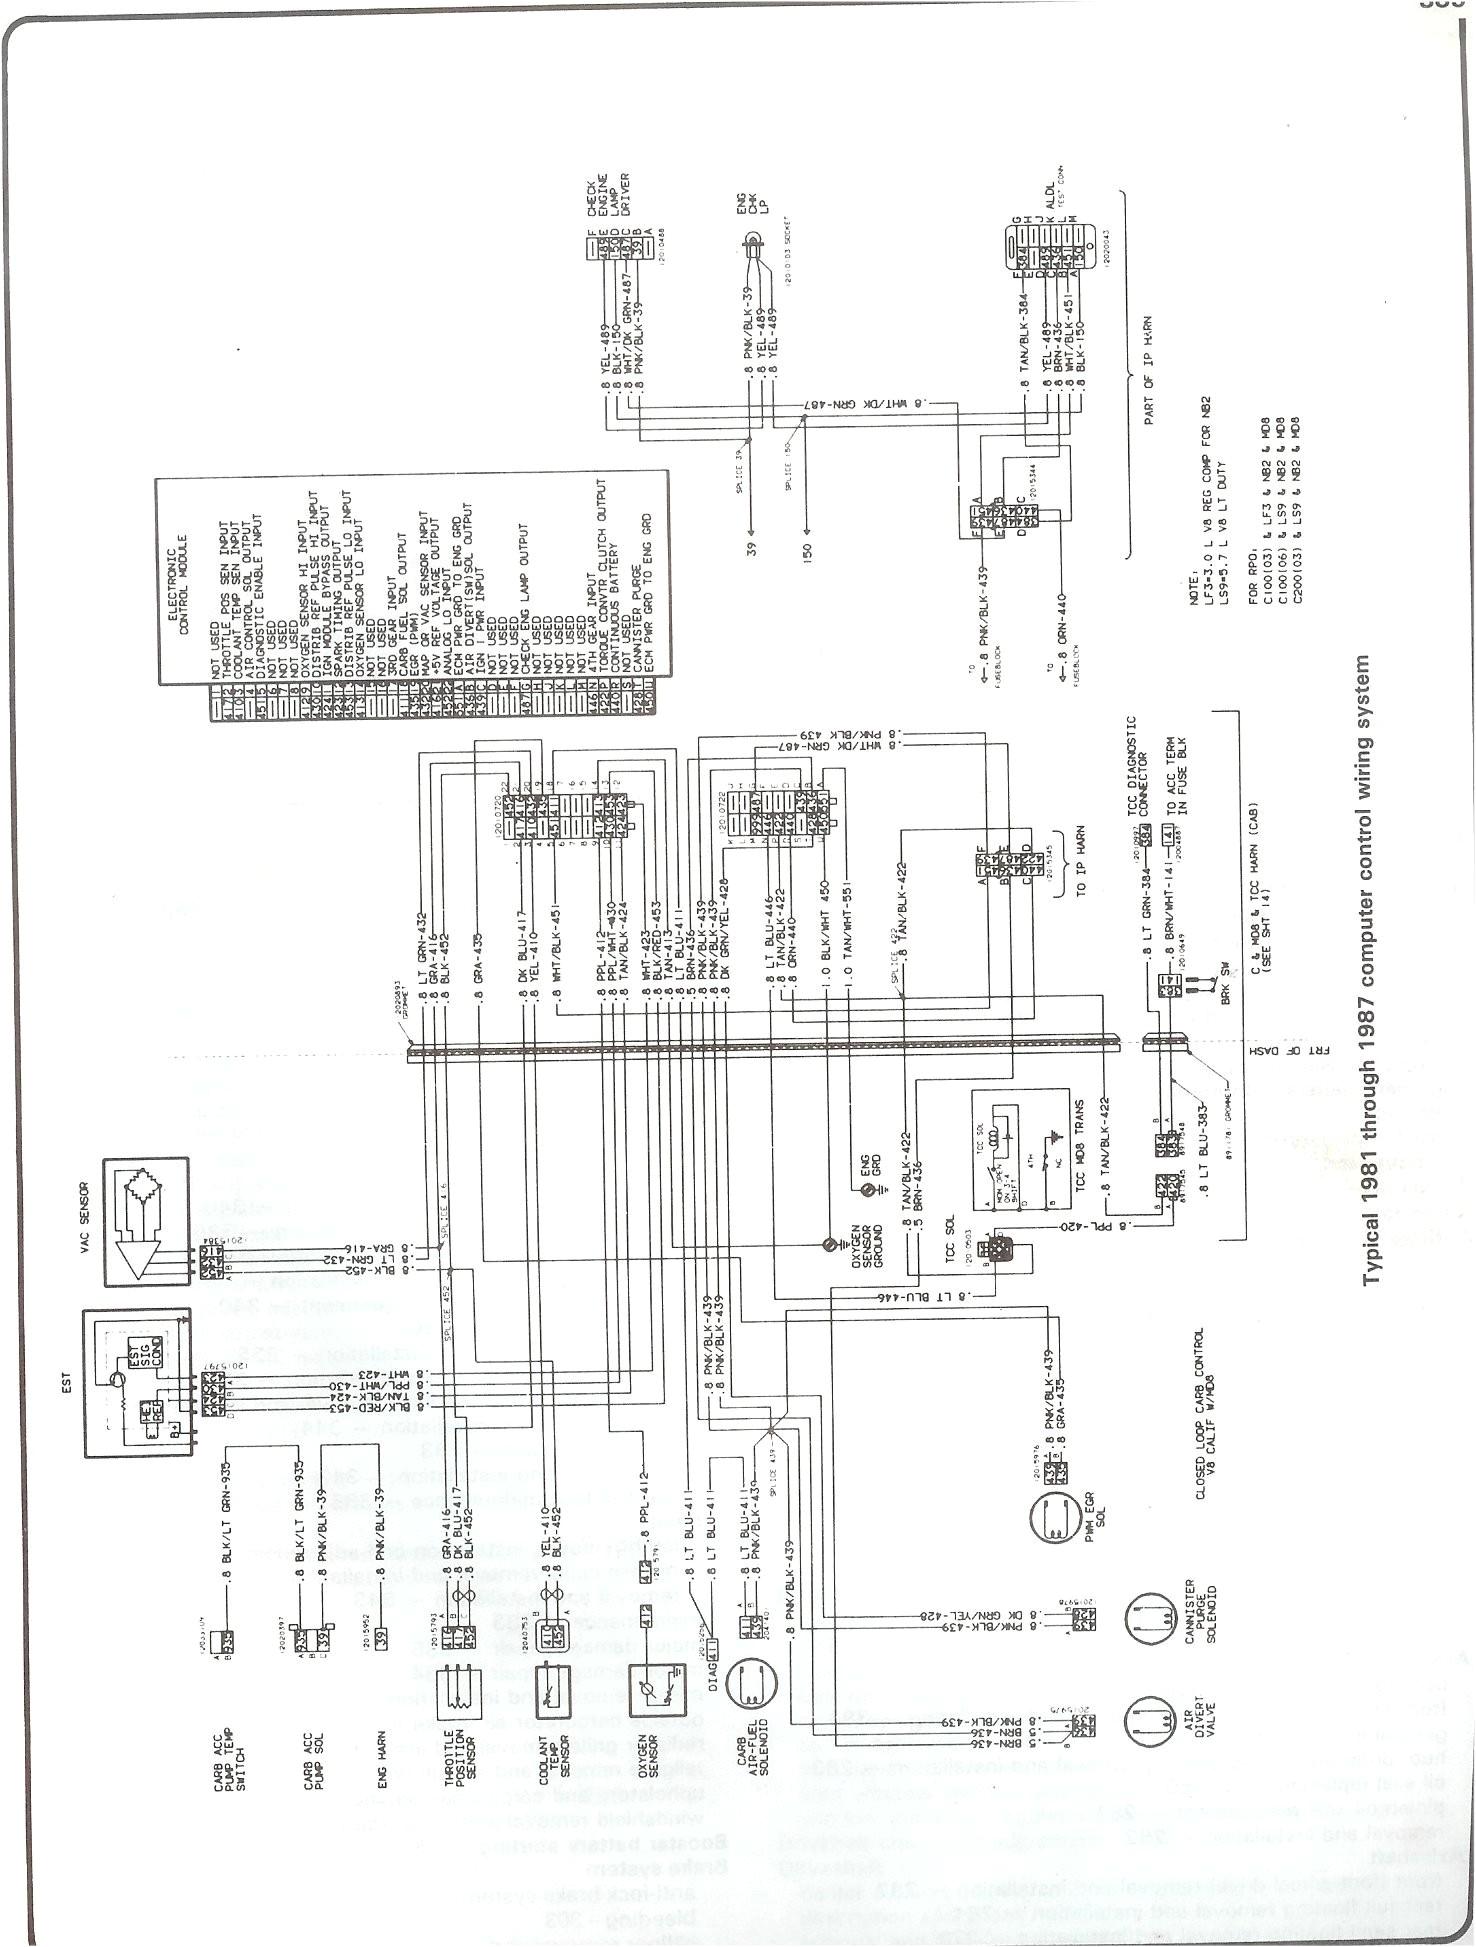 77 gmc wiring wiring diagram mix 77 silverado wiring harness schema diagram database77 silverado wiring harness